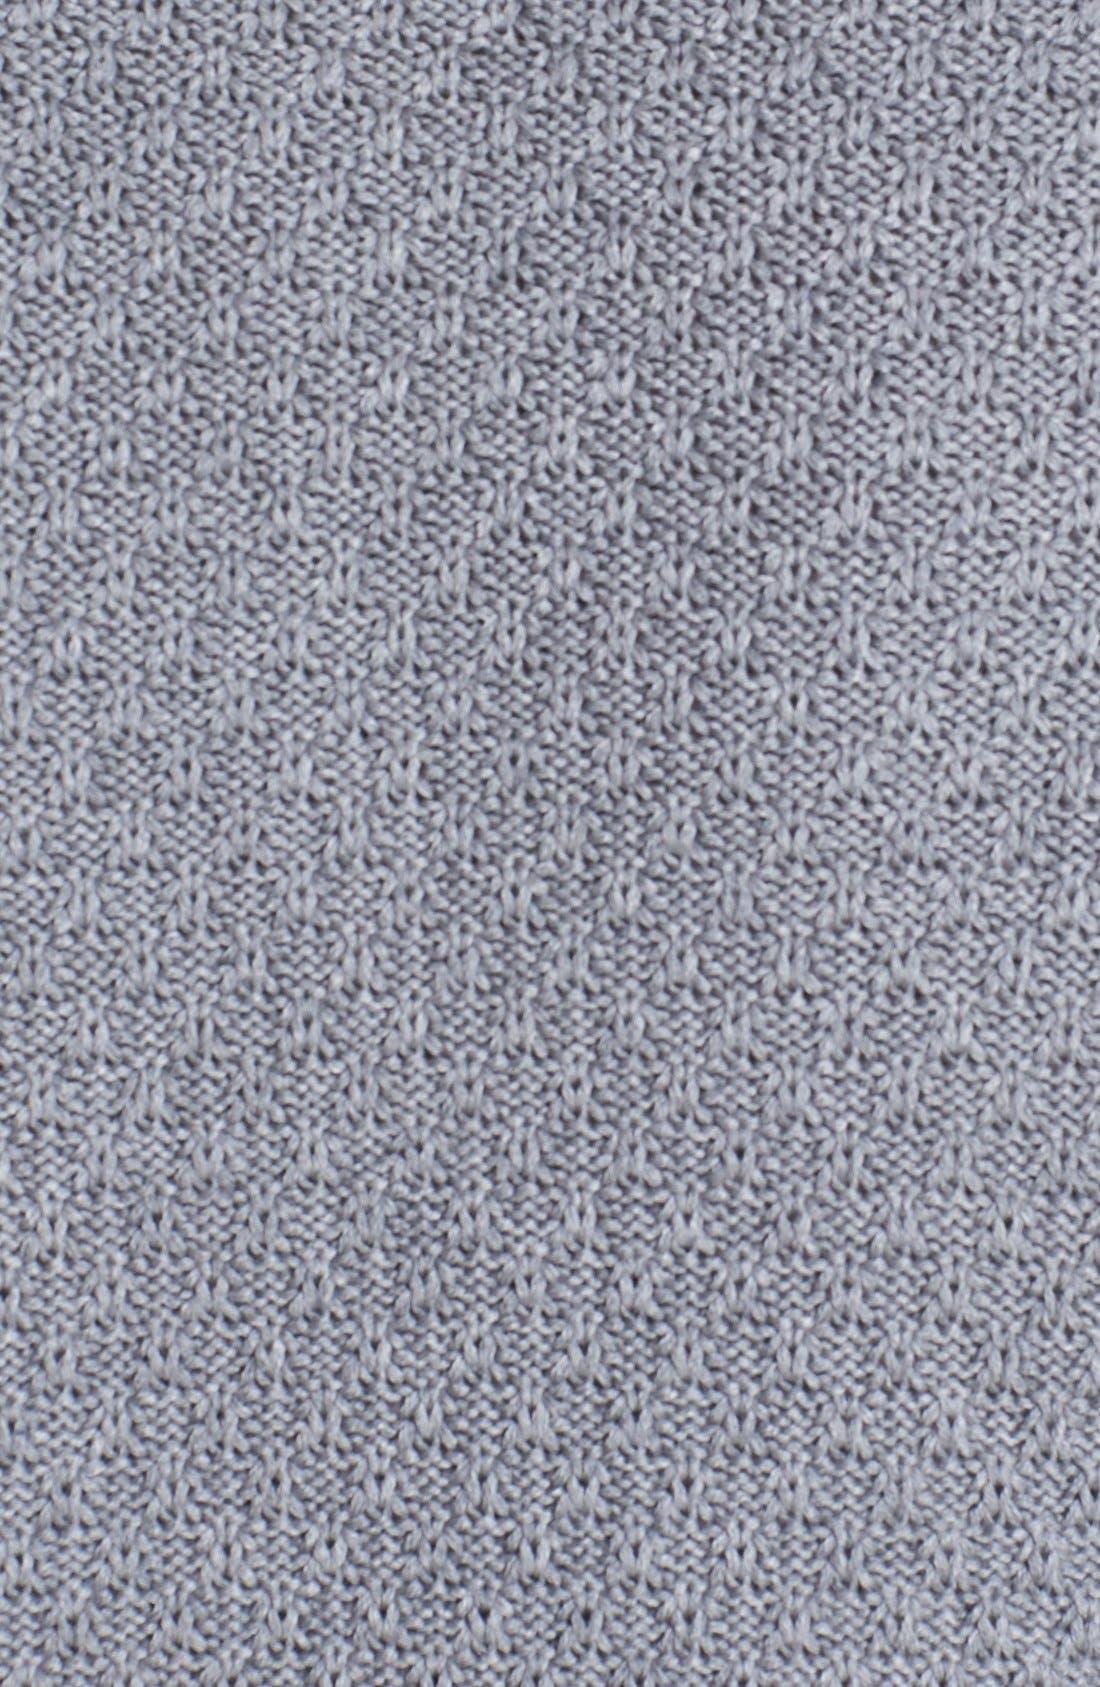 Alternate Image 3  - Billy Reid Honeycomb Knit Crewneck Sweater